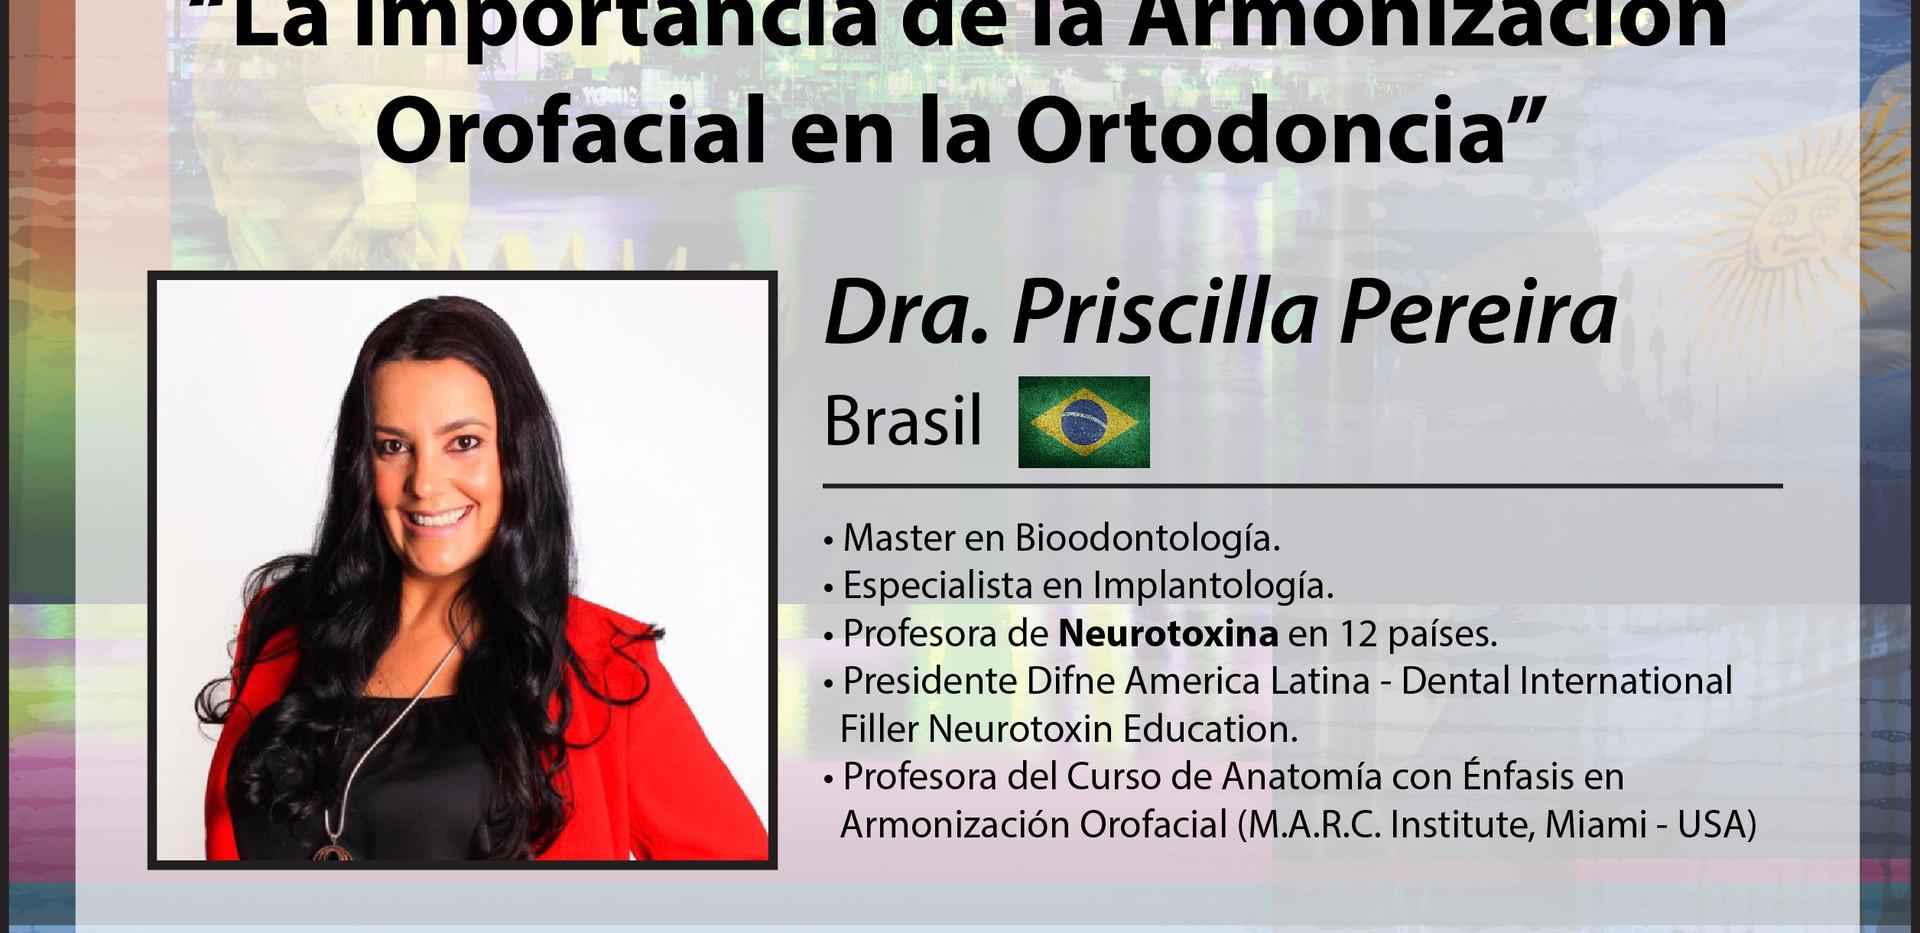 Dra. Priscilla Pereira